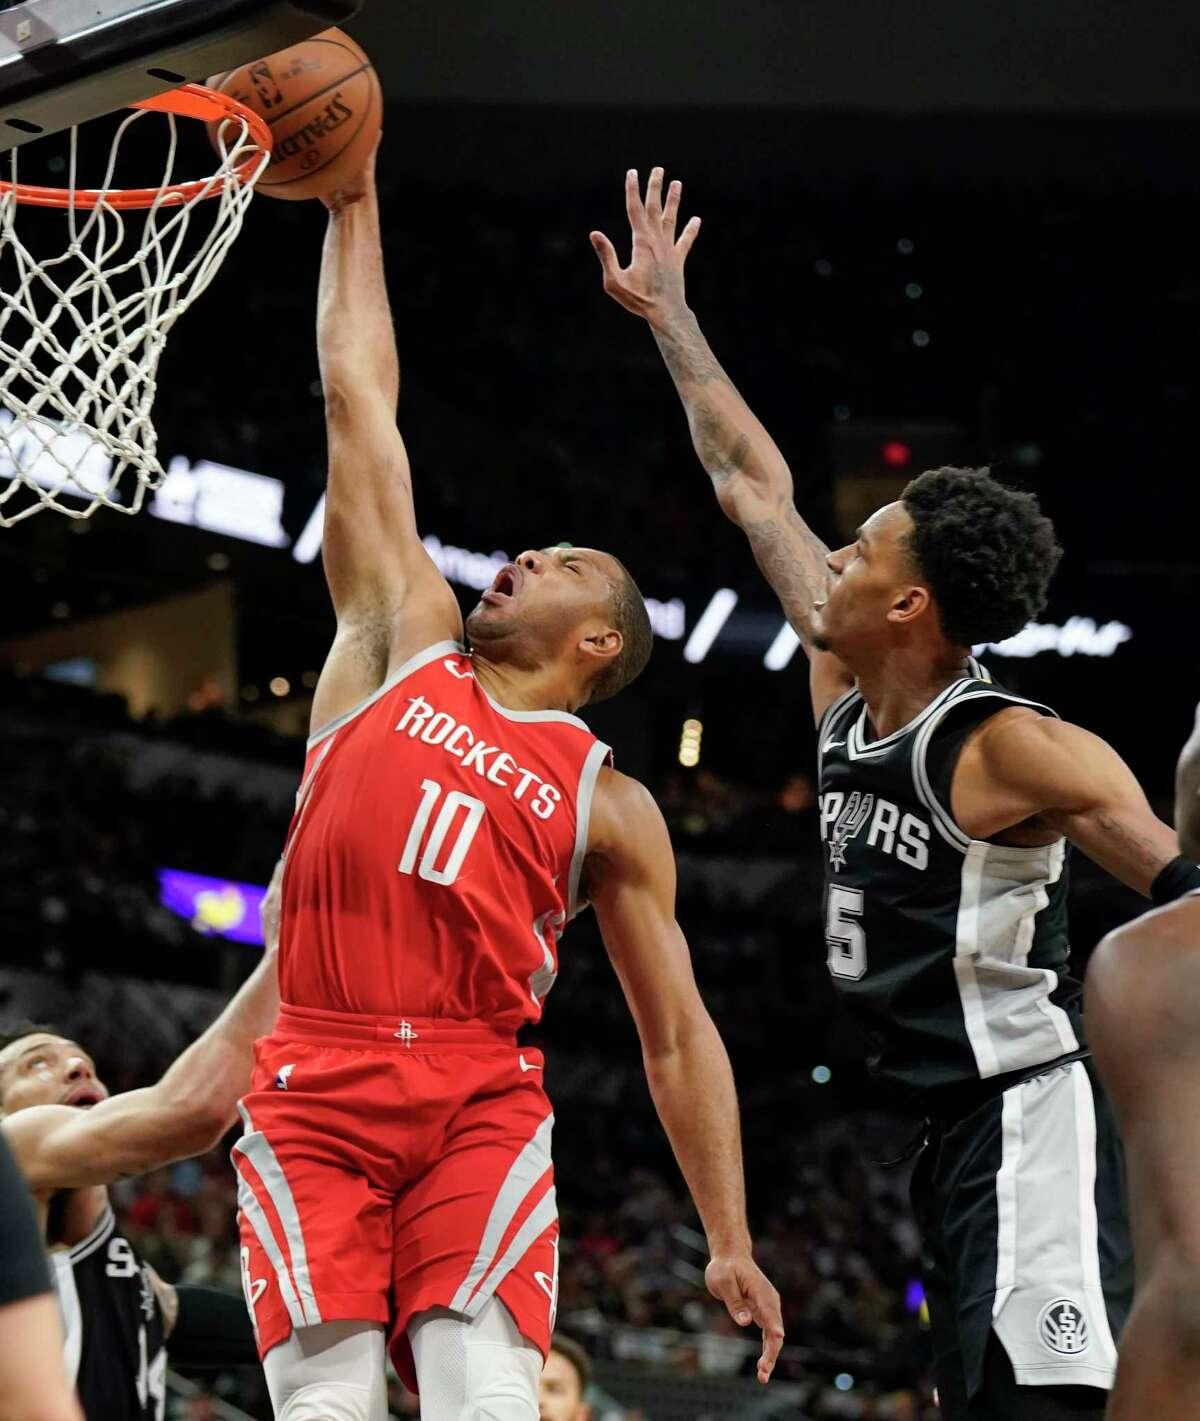 Houston Rockets' Eric Gordon (10) shoots against San Antonio Spurs' Dejounte Murray during the first half of an NBA basketball game, Sunday, April 1, 2018, in San Antonio. (AP Photo/Darren Abate)